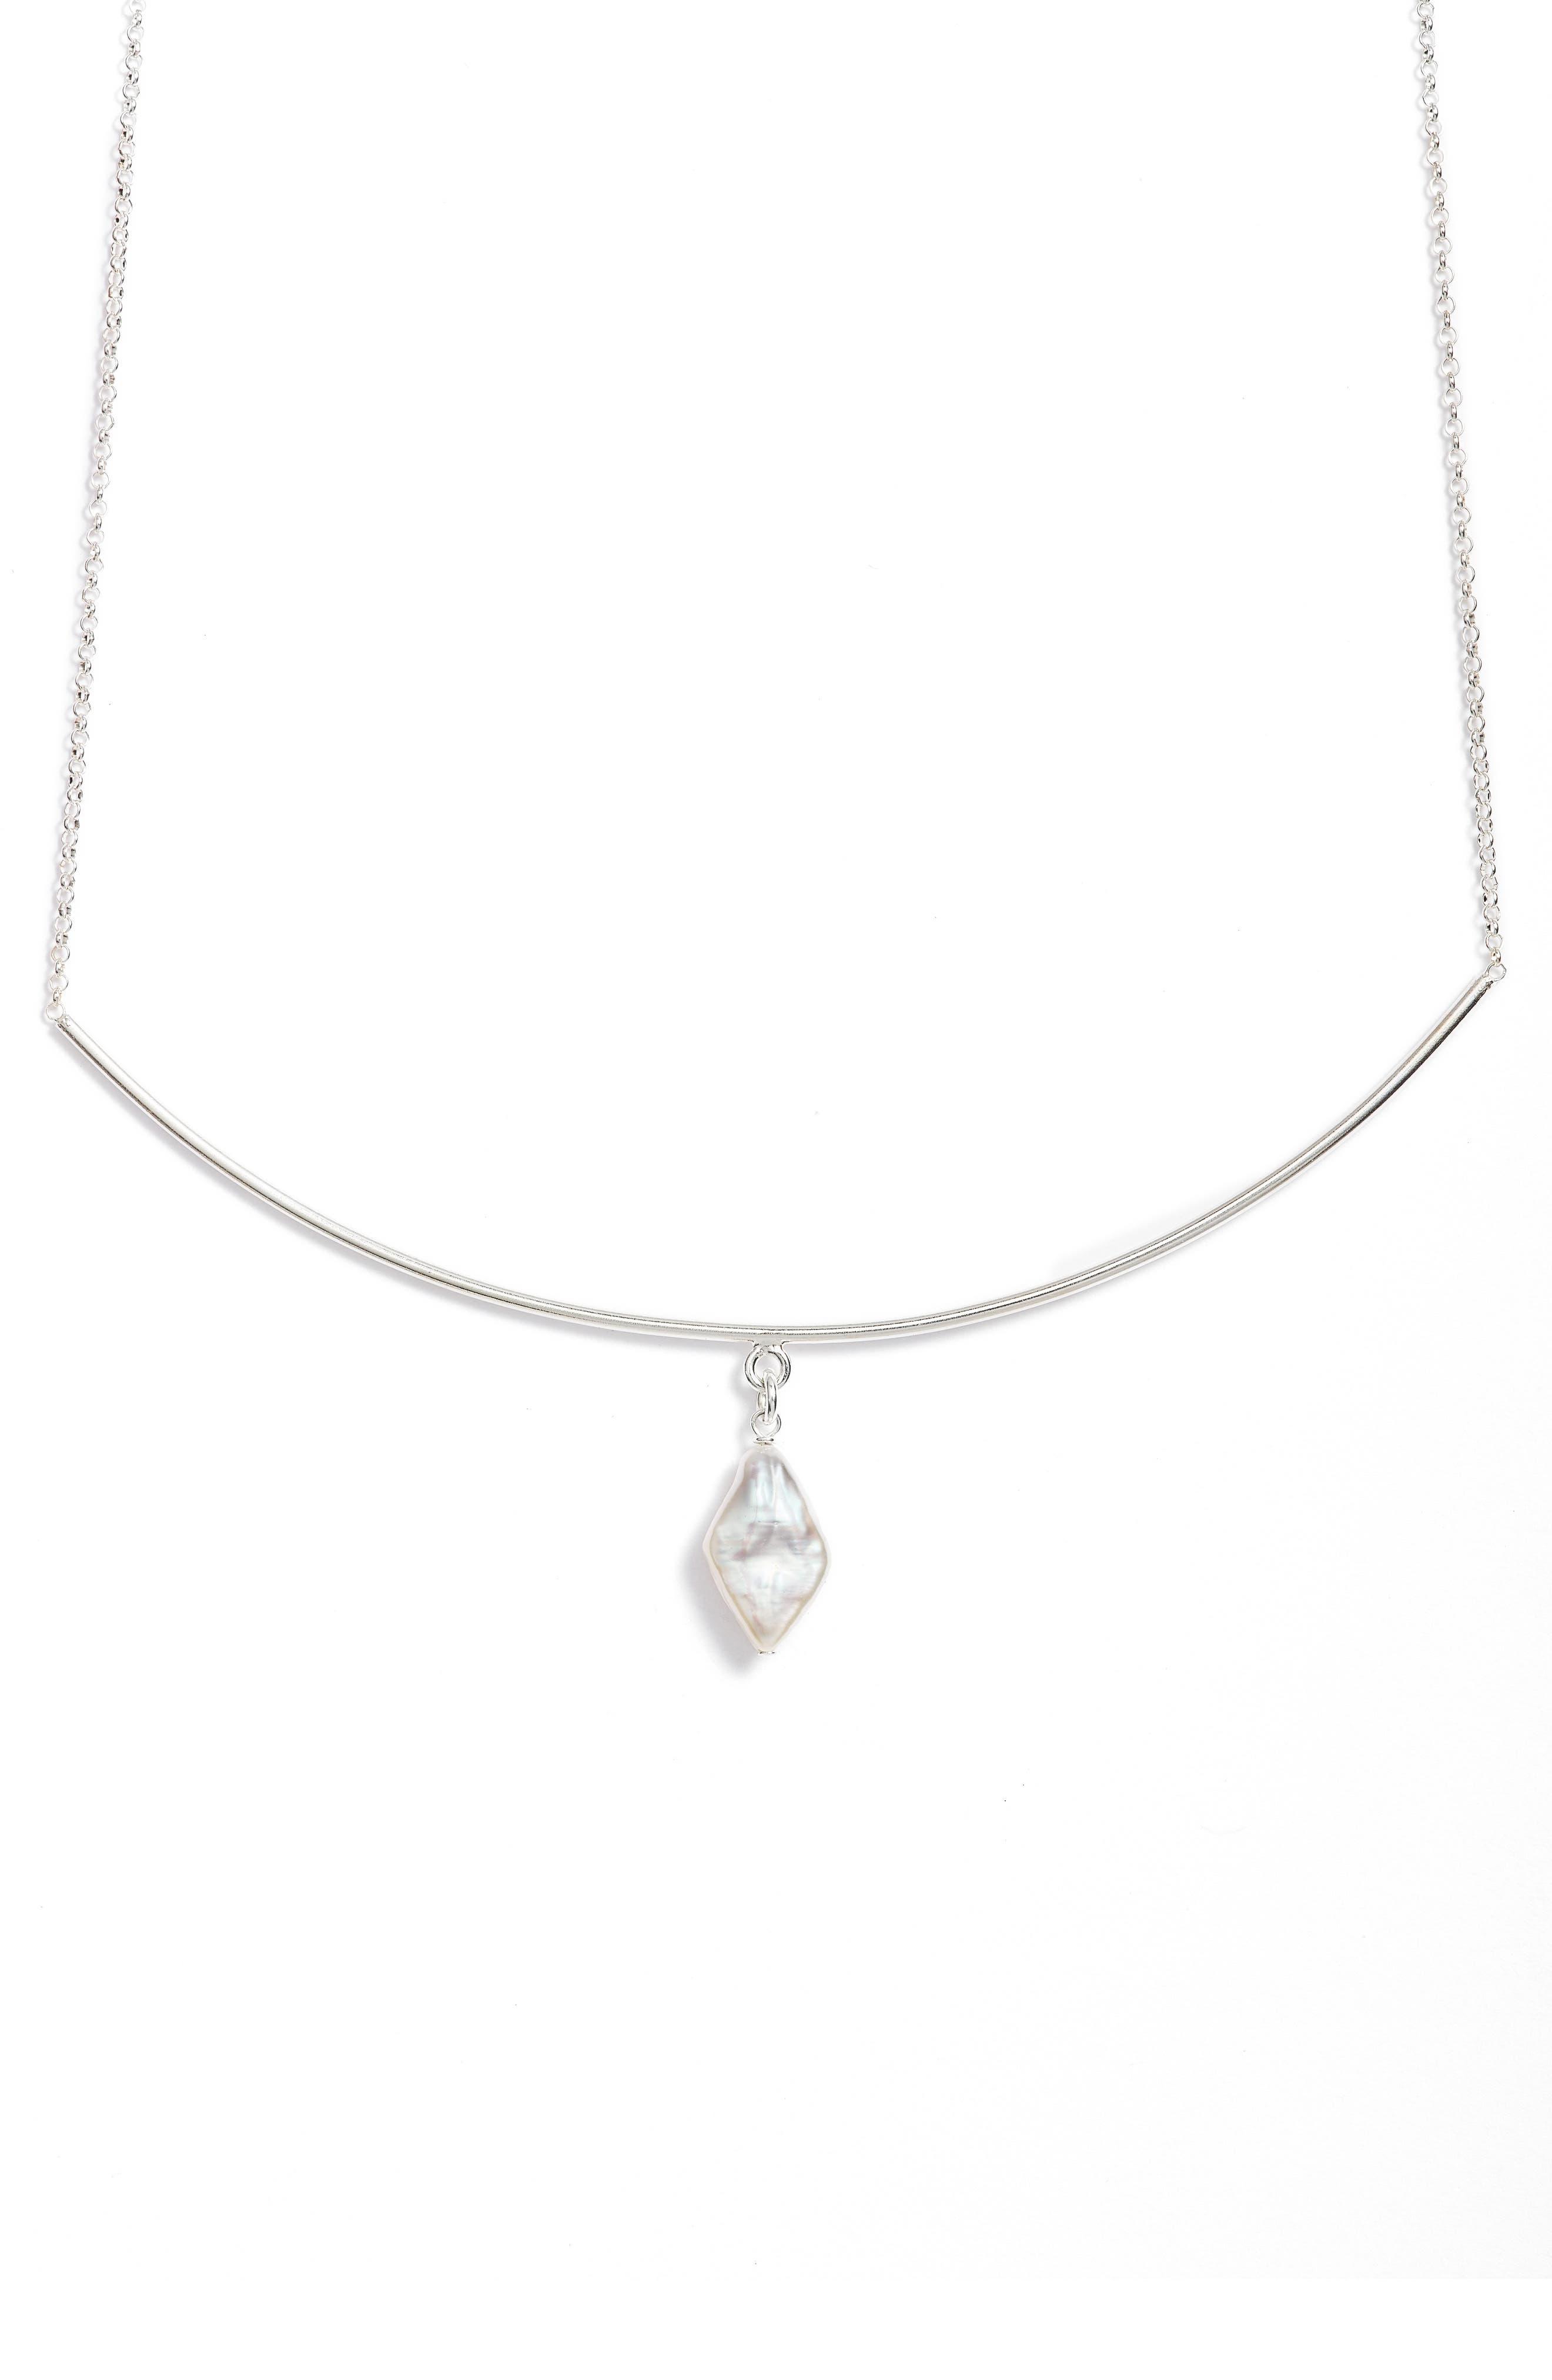 Balance Pearl Bar Necklace,                             Alternate thumbnail 3, color,                             040